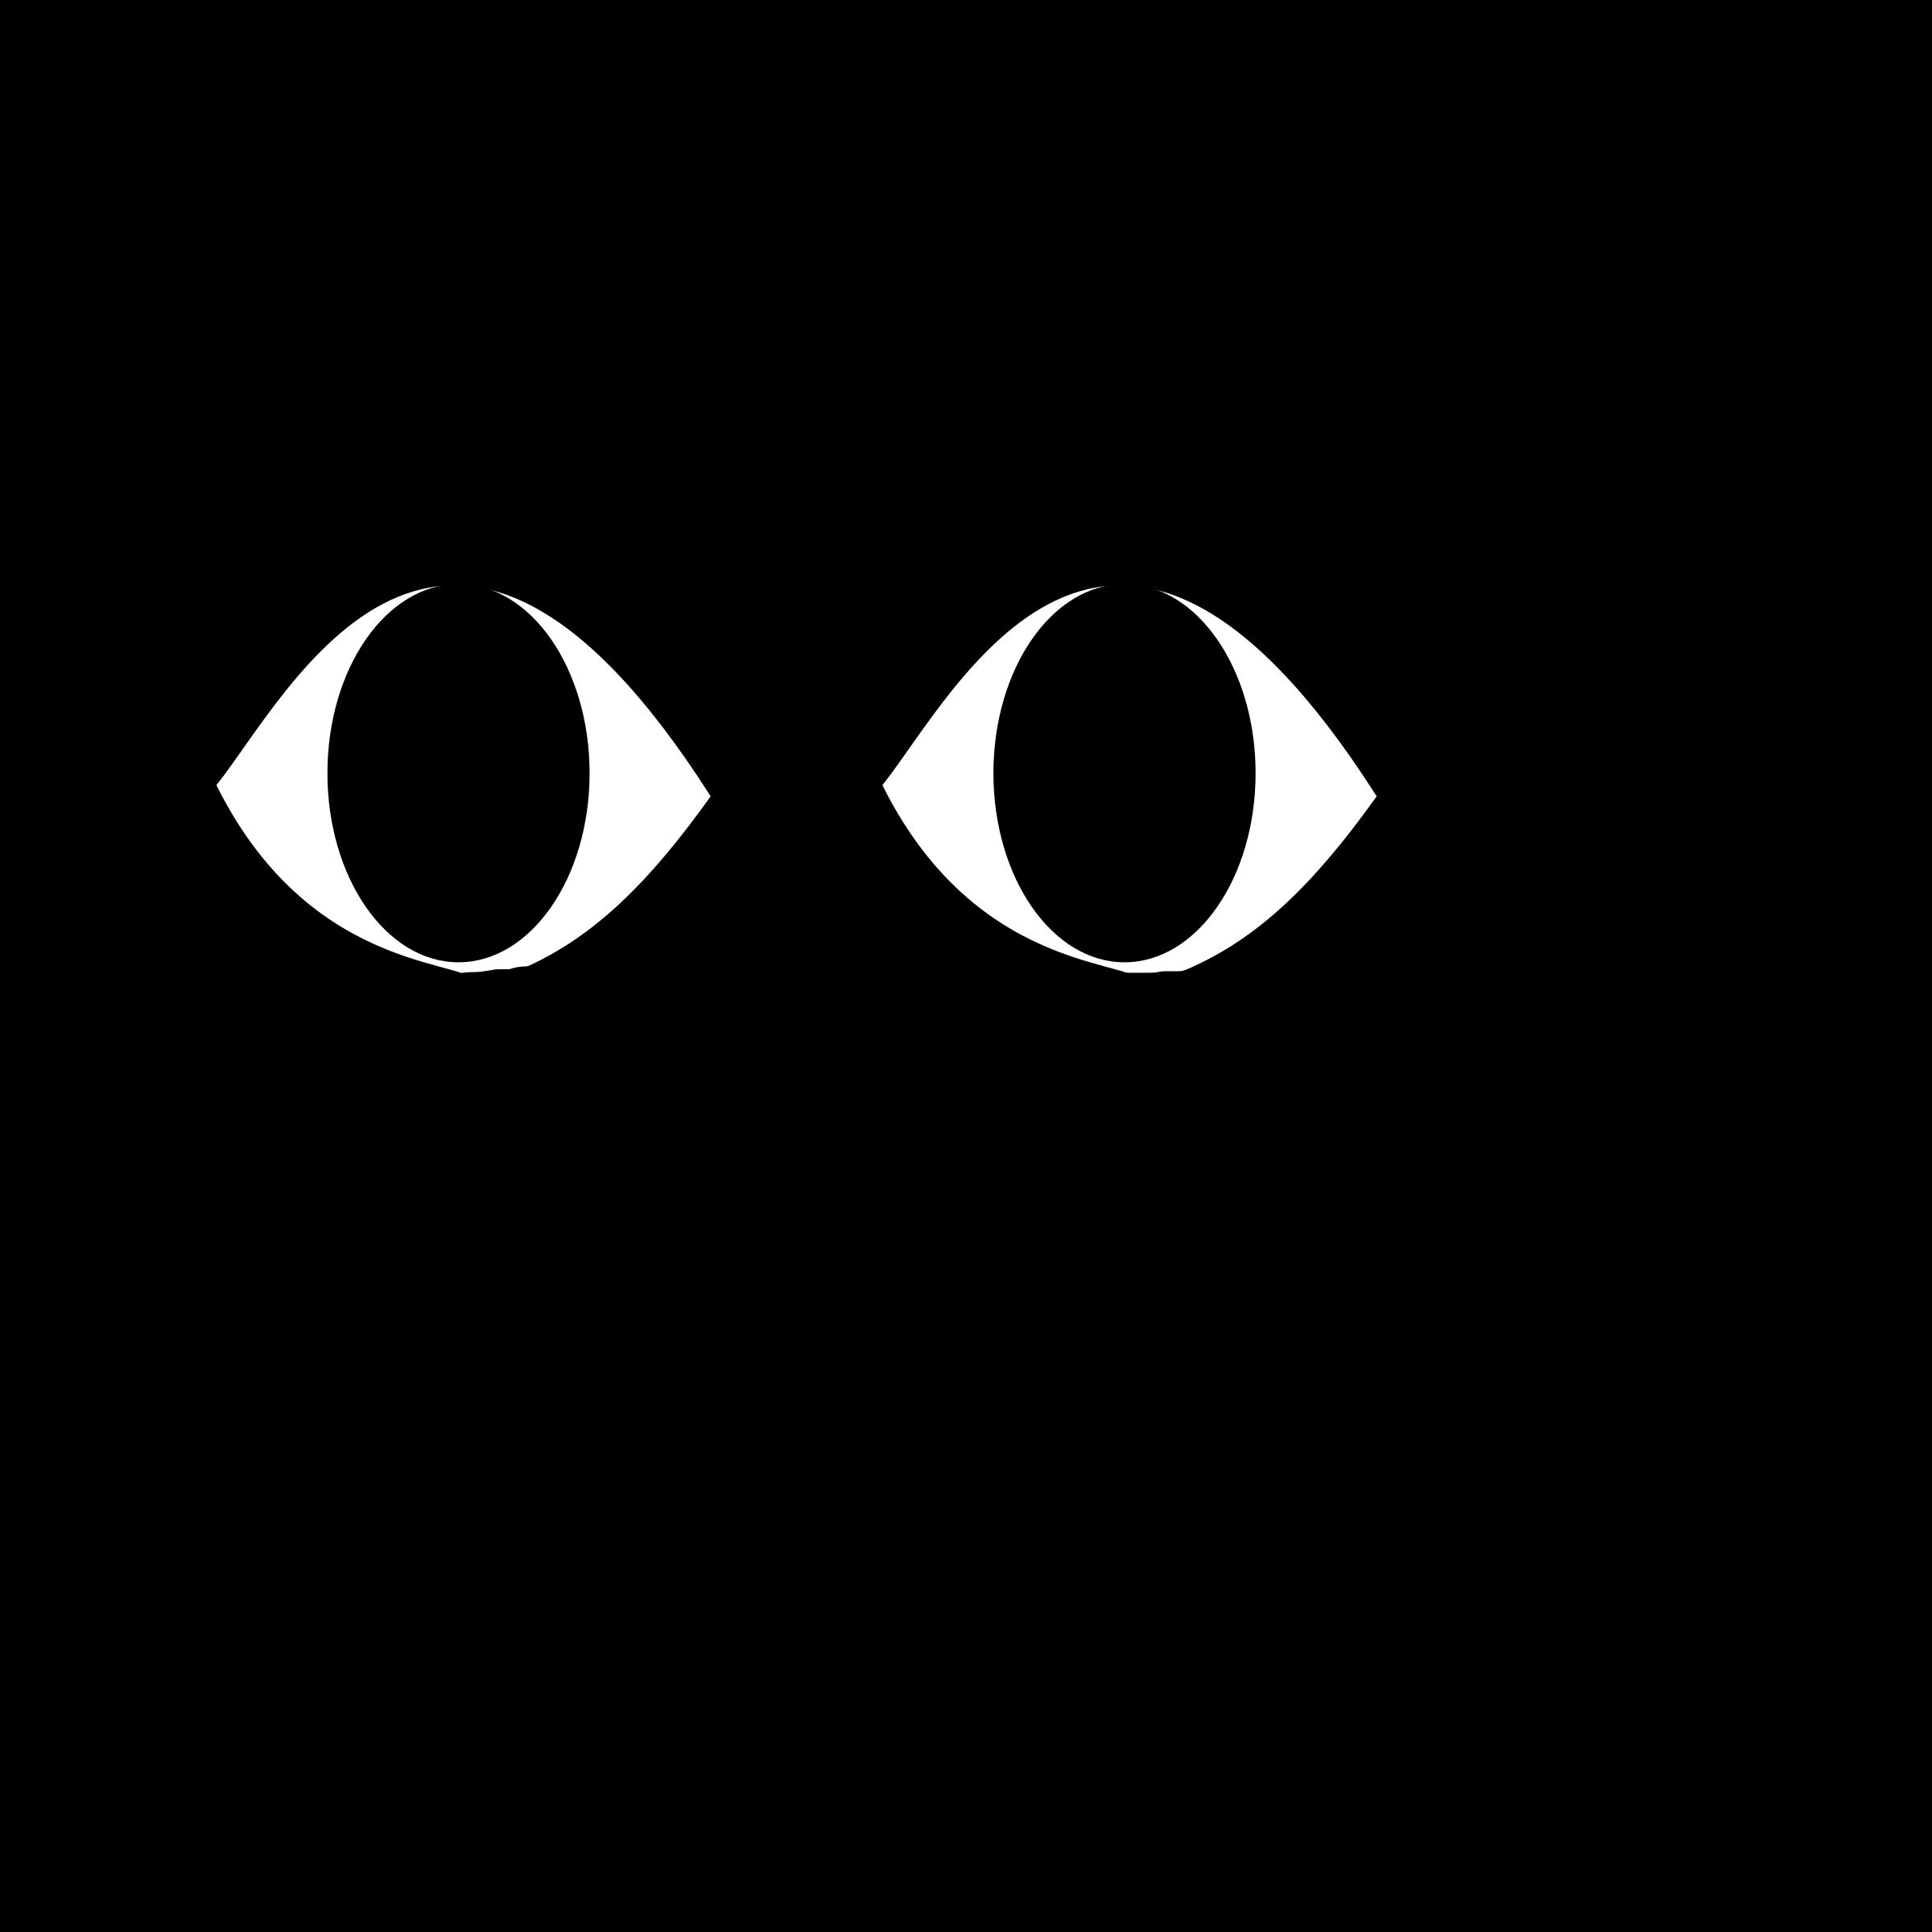 Black cat clipart 1 image png.